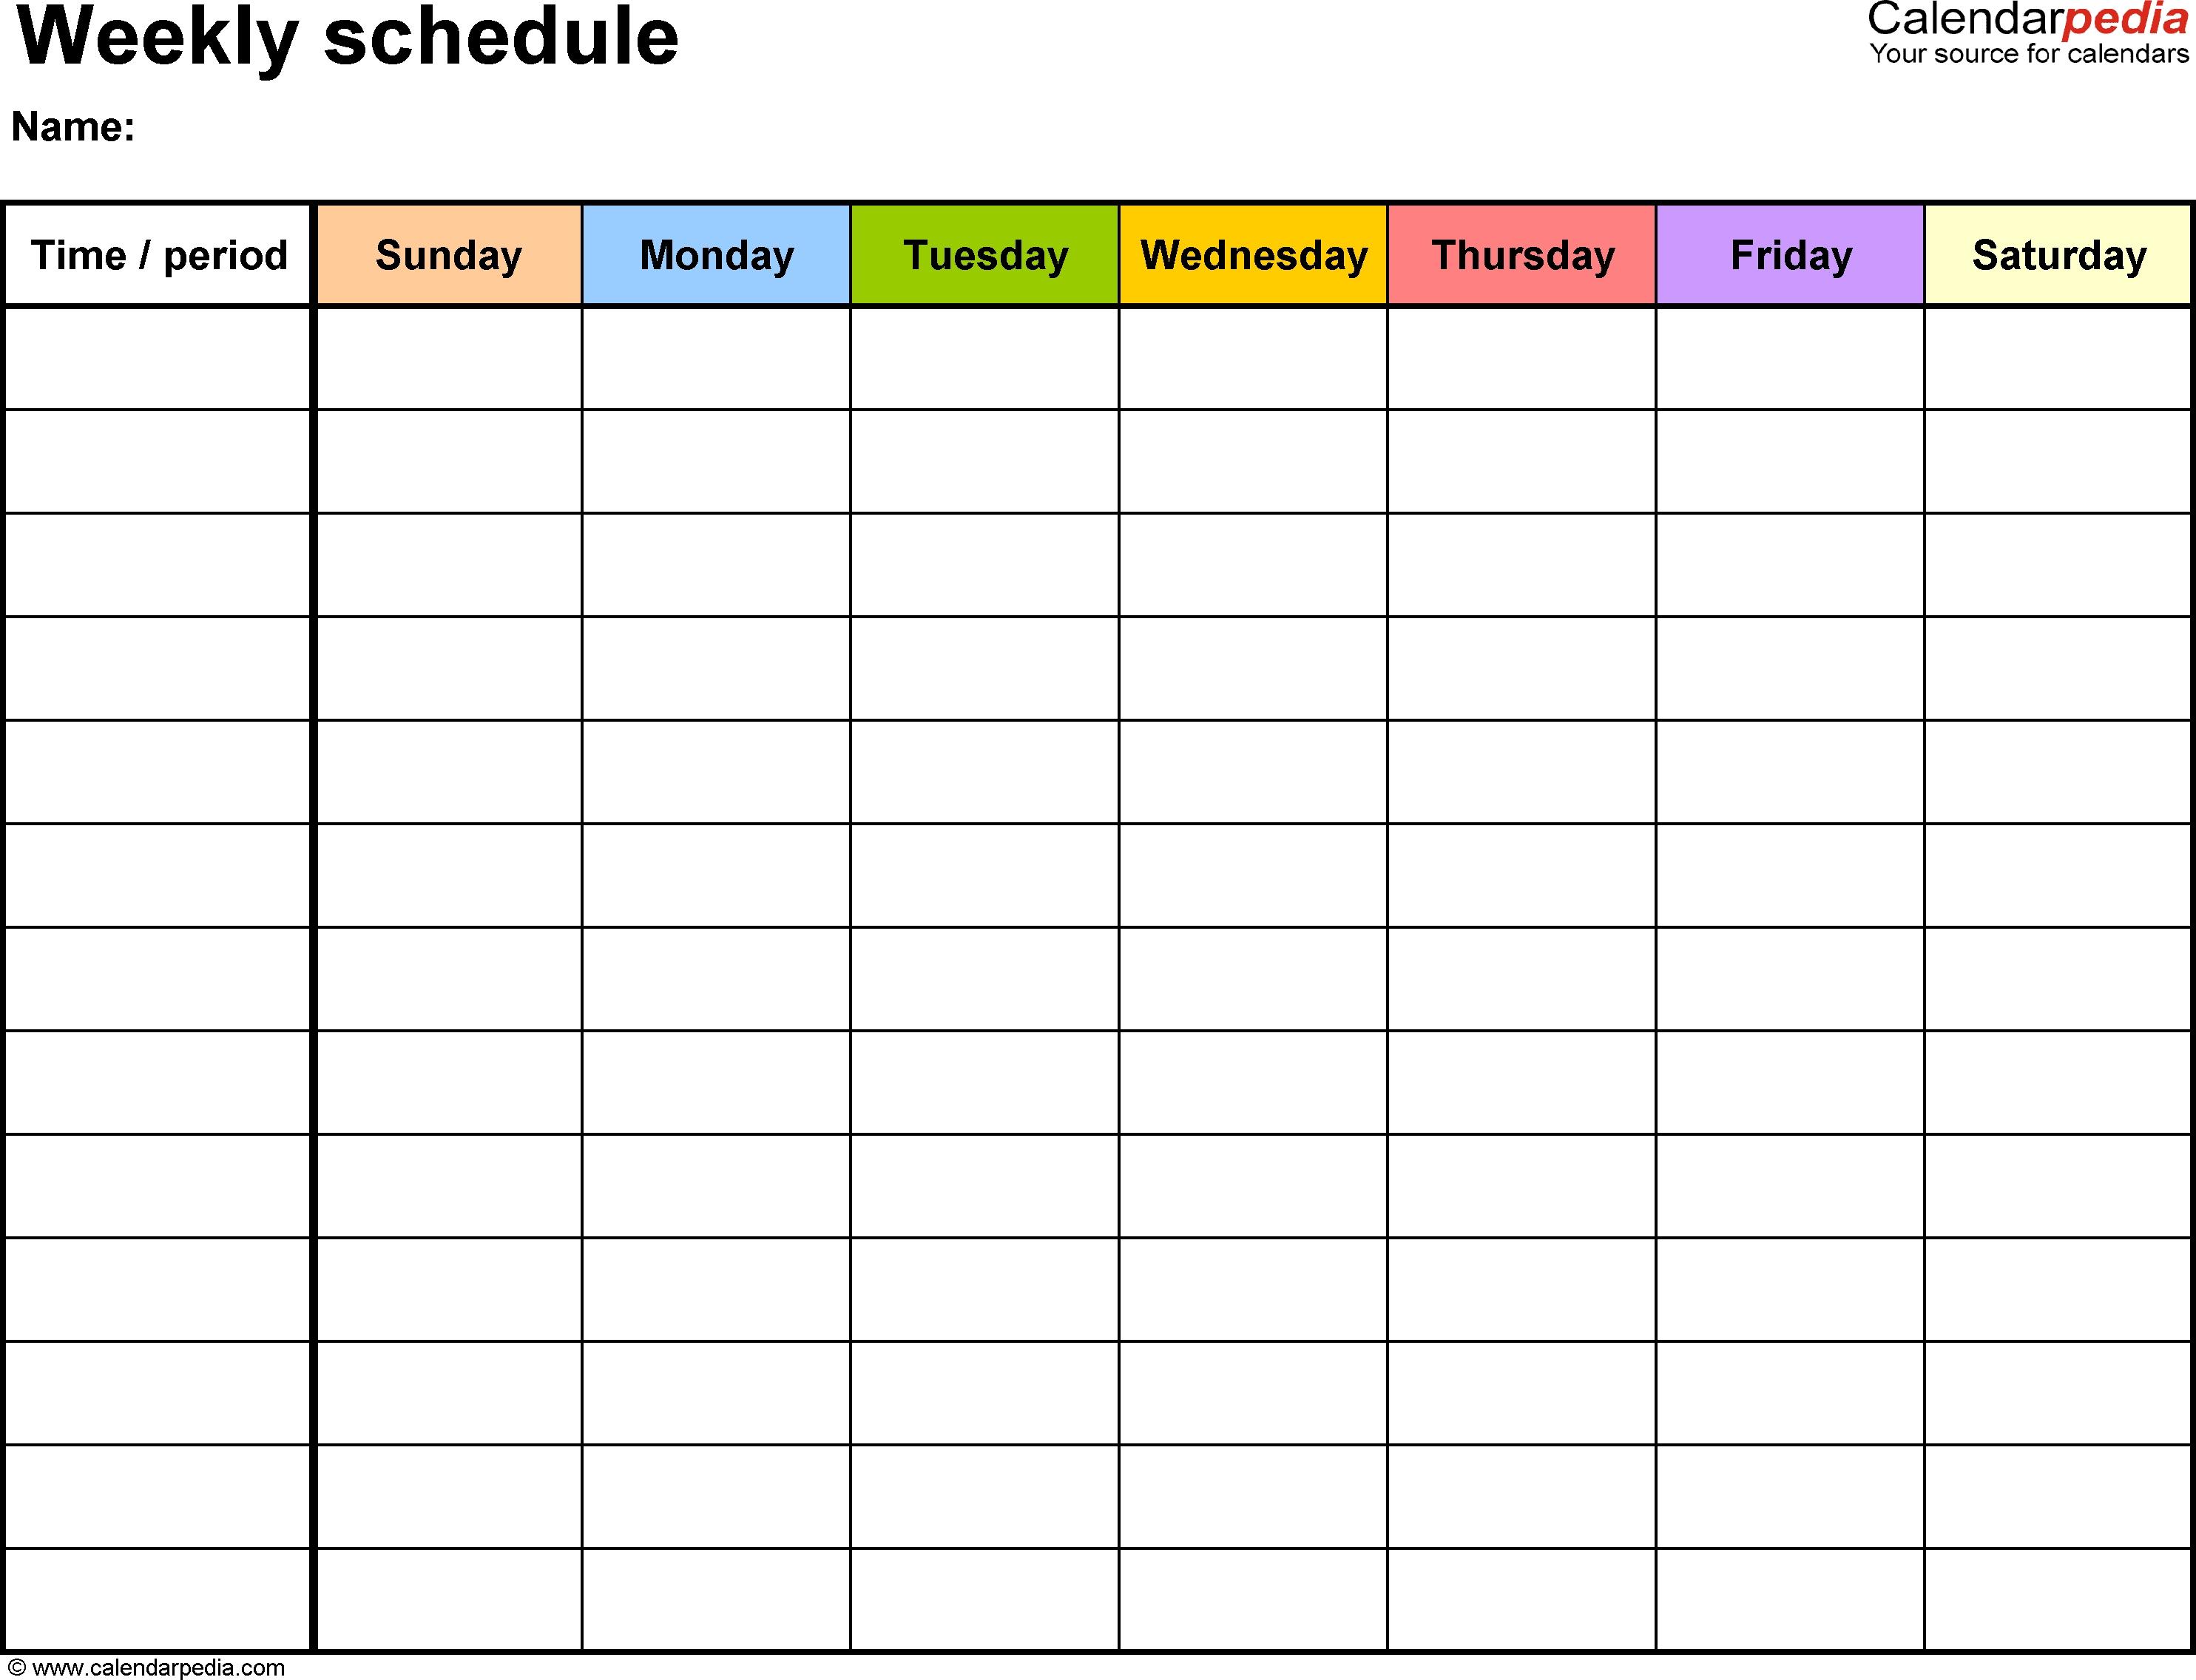 6 Week Schedule Template - Kairo.houseofstrauss.co